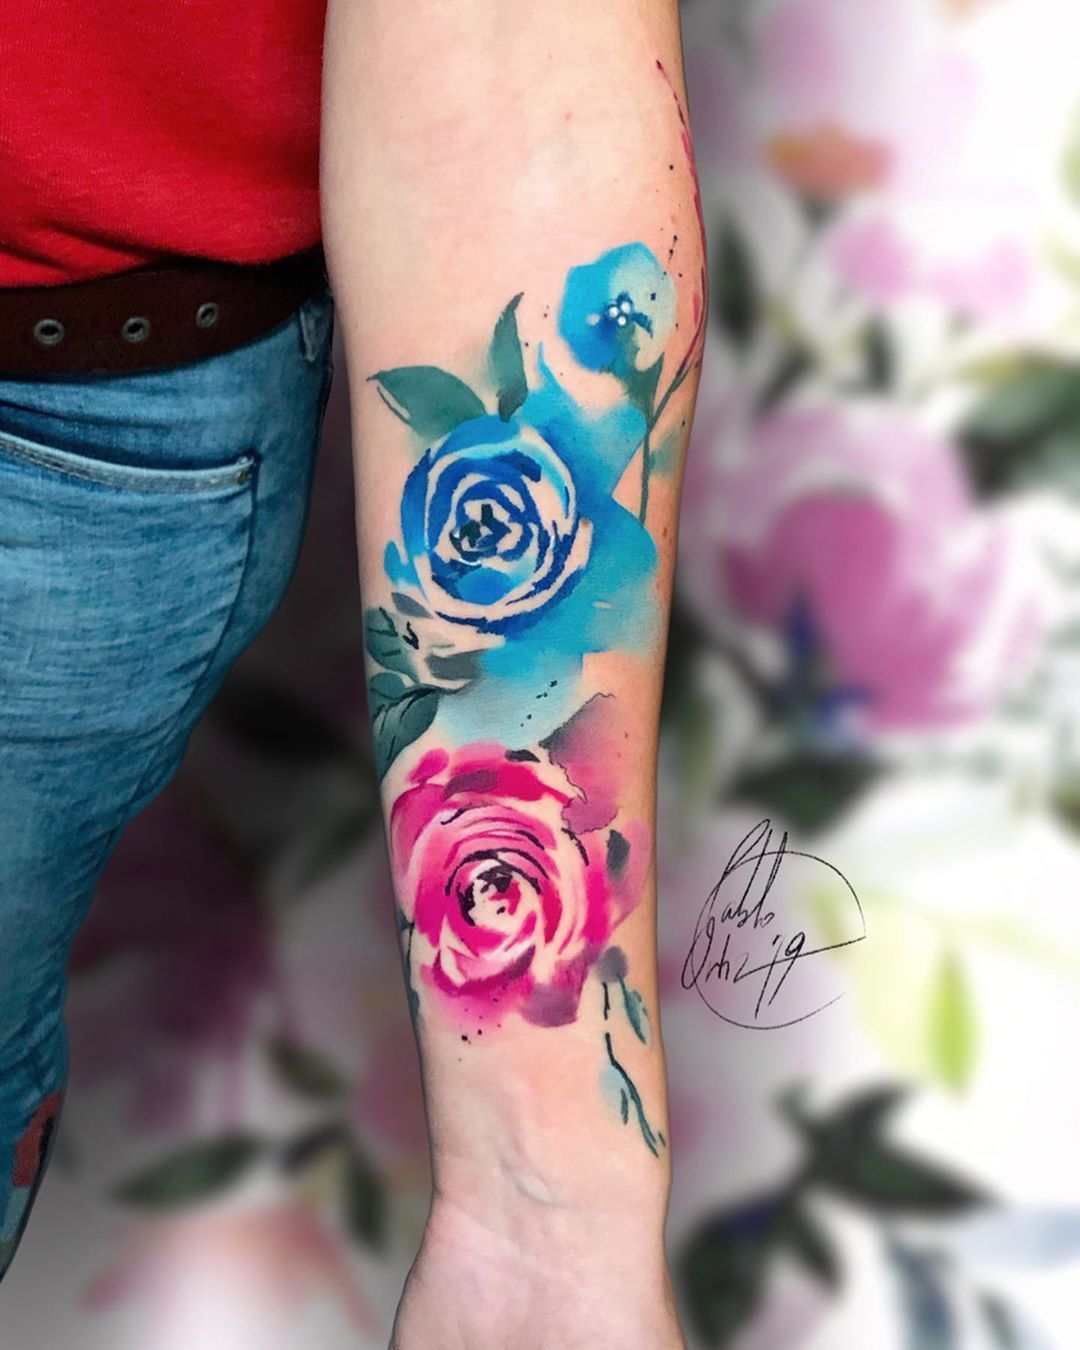 Yin  Yang  .... ⏪⏪⏪ SWIPE & SHARE! ⏪⏪⏪...Done in @la_rosa_muerta ..▪️ #avantgardetattoo ▪️......#pabloortiztattoo #watercolortattoo #pabloortiz #tattooed #tattooart #watercolortattoos #tattoos #flower #watercolortattoos #tattoomodel #barcelona #flowertattoo #love #watercolorflower #flowerwatercolor  @arts.hub @thebesttattooartists @inkpplcom @worldtattoogallery @tattooarmada @devine.tatts @tattoosocial @ink.tatts @thinkbeforeuink @txttoo @thebestspaintattooartists @tattoomediaink @tattrx  @colou